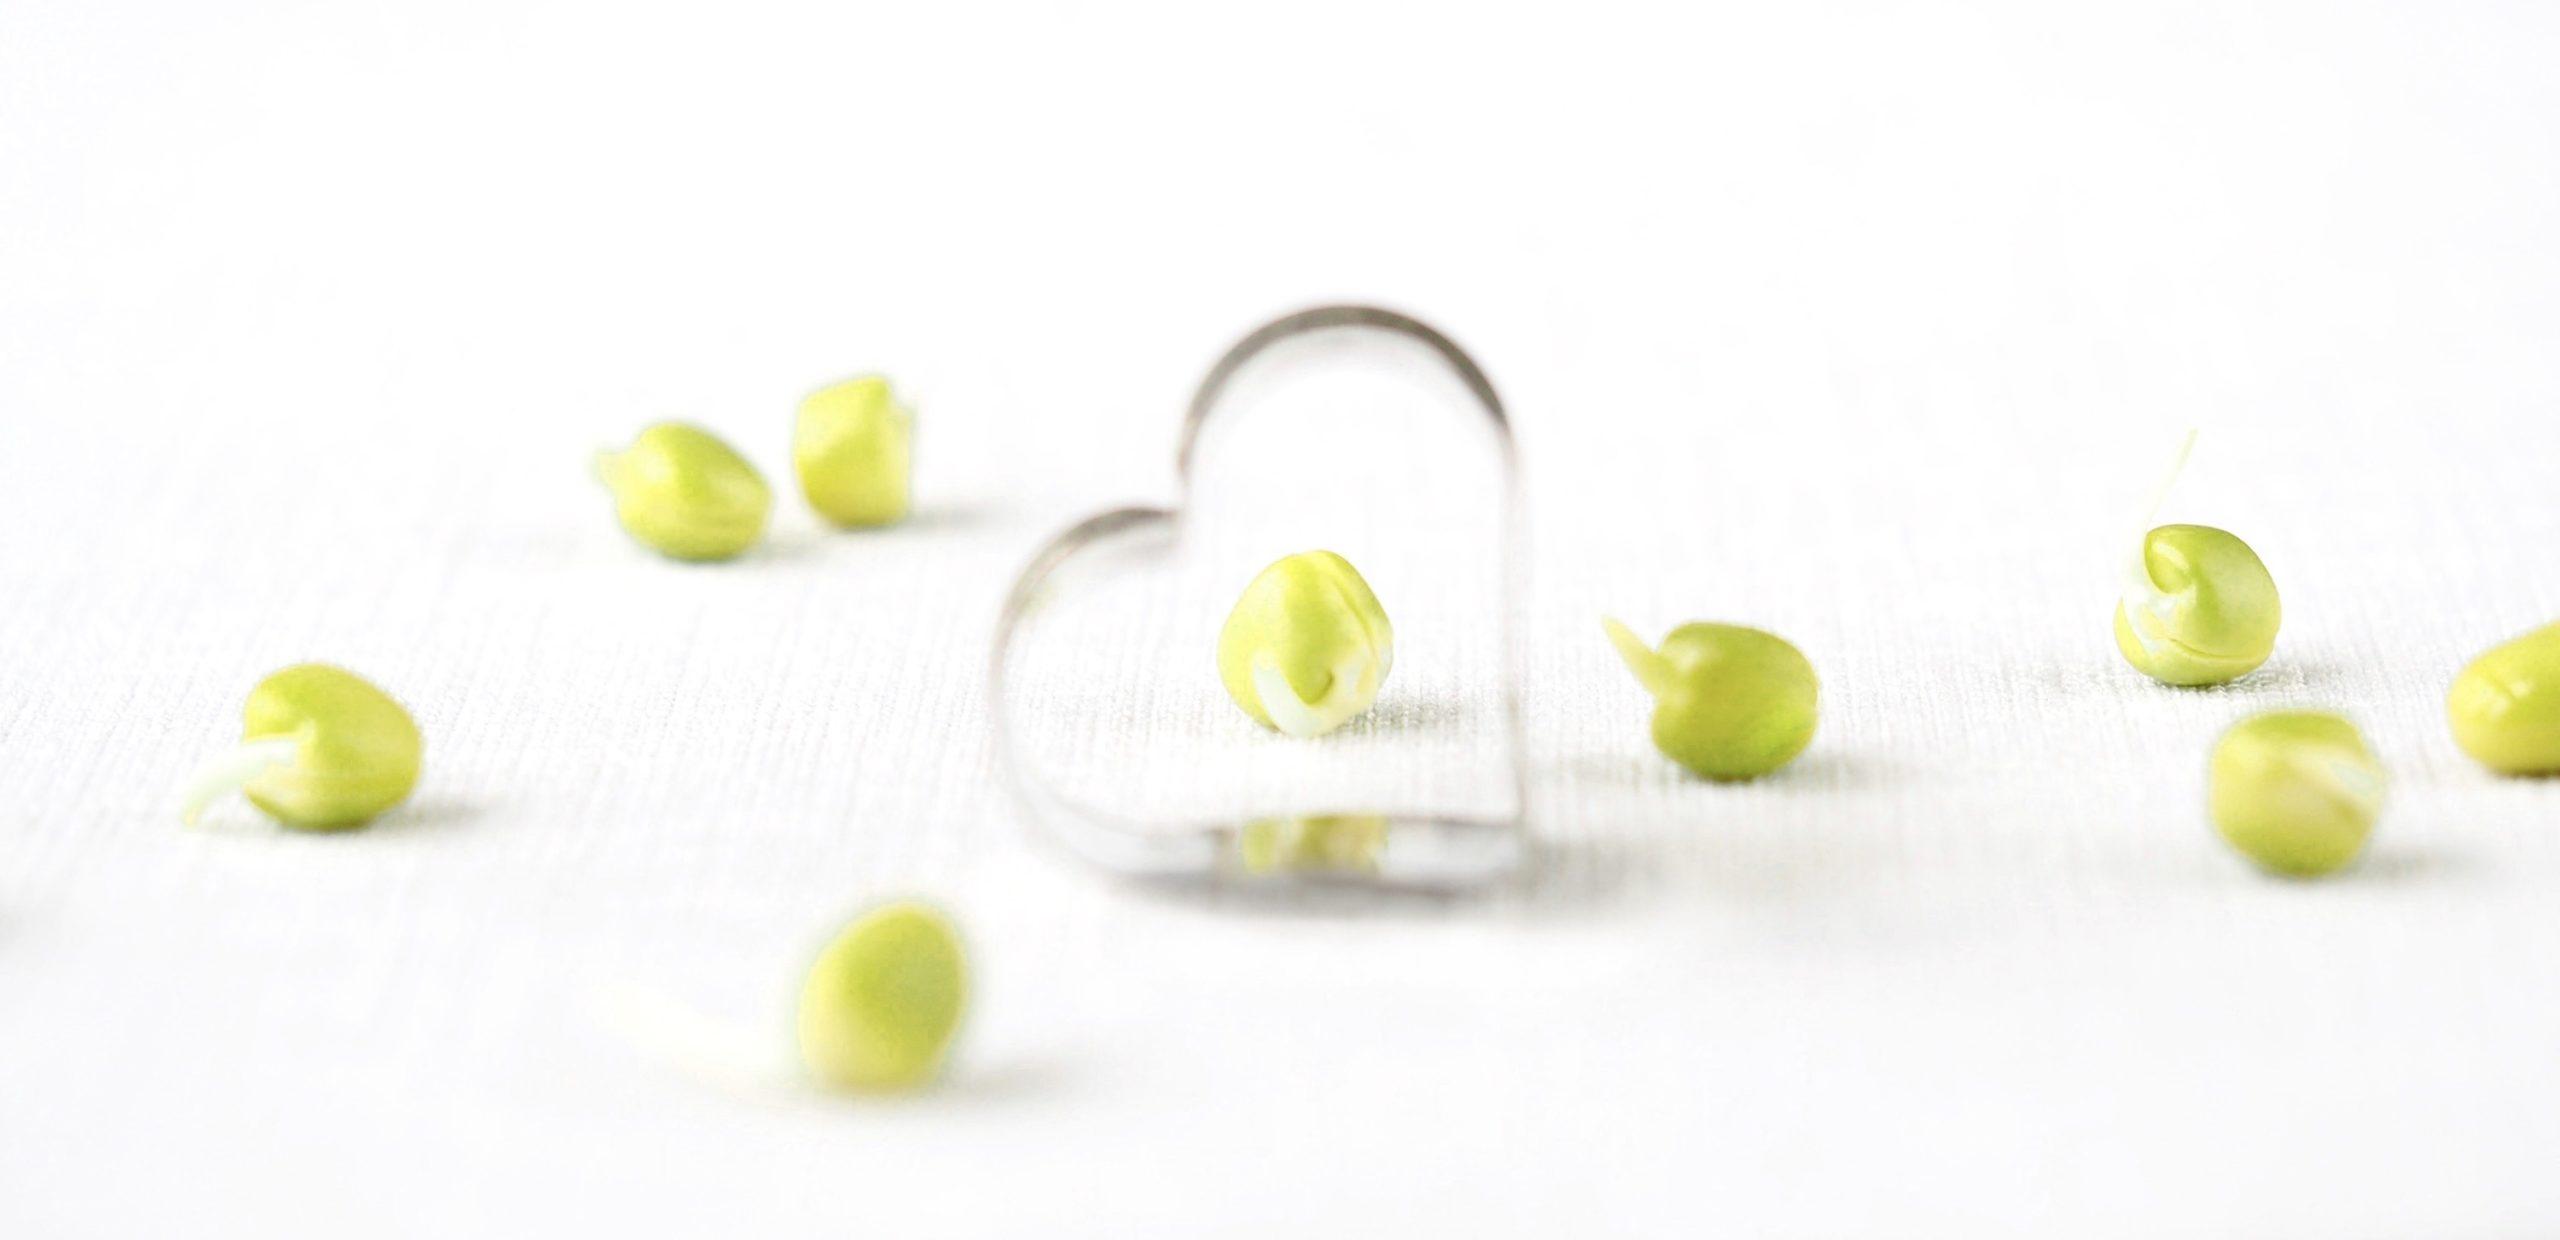 Kvalitetsfrø til spirer og mikrogrønt